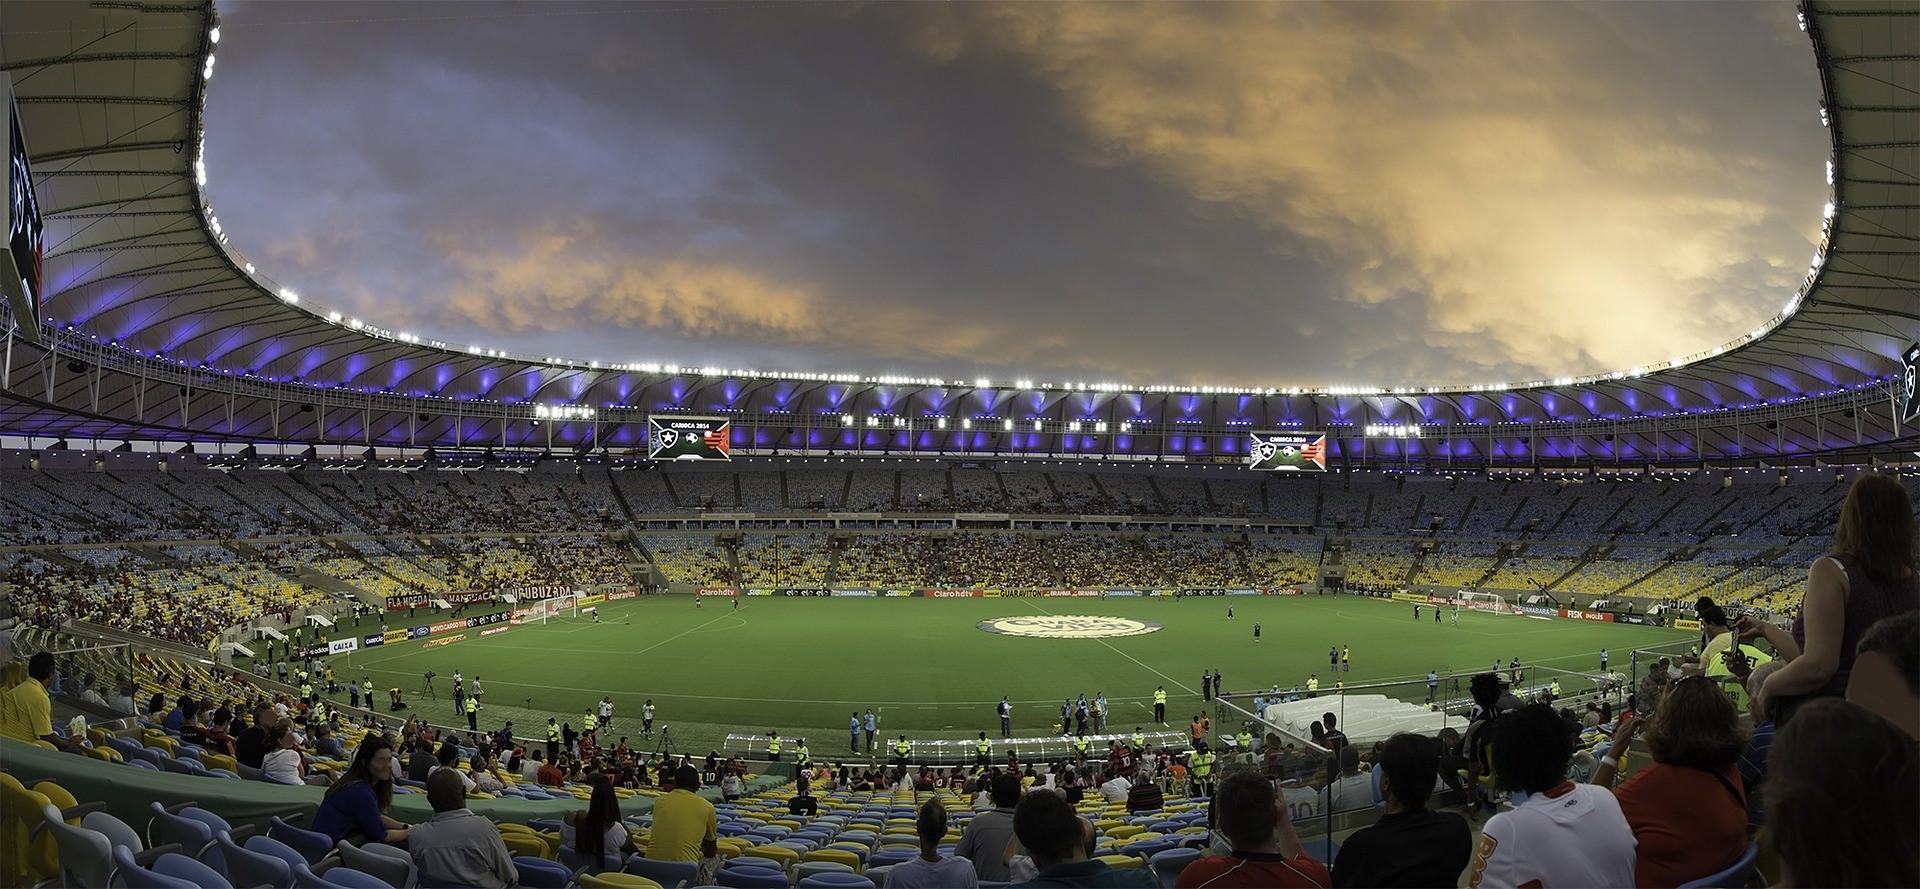 Santa Teresa - Rio de Janeiro - RJ